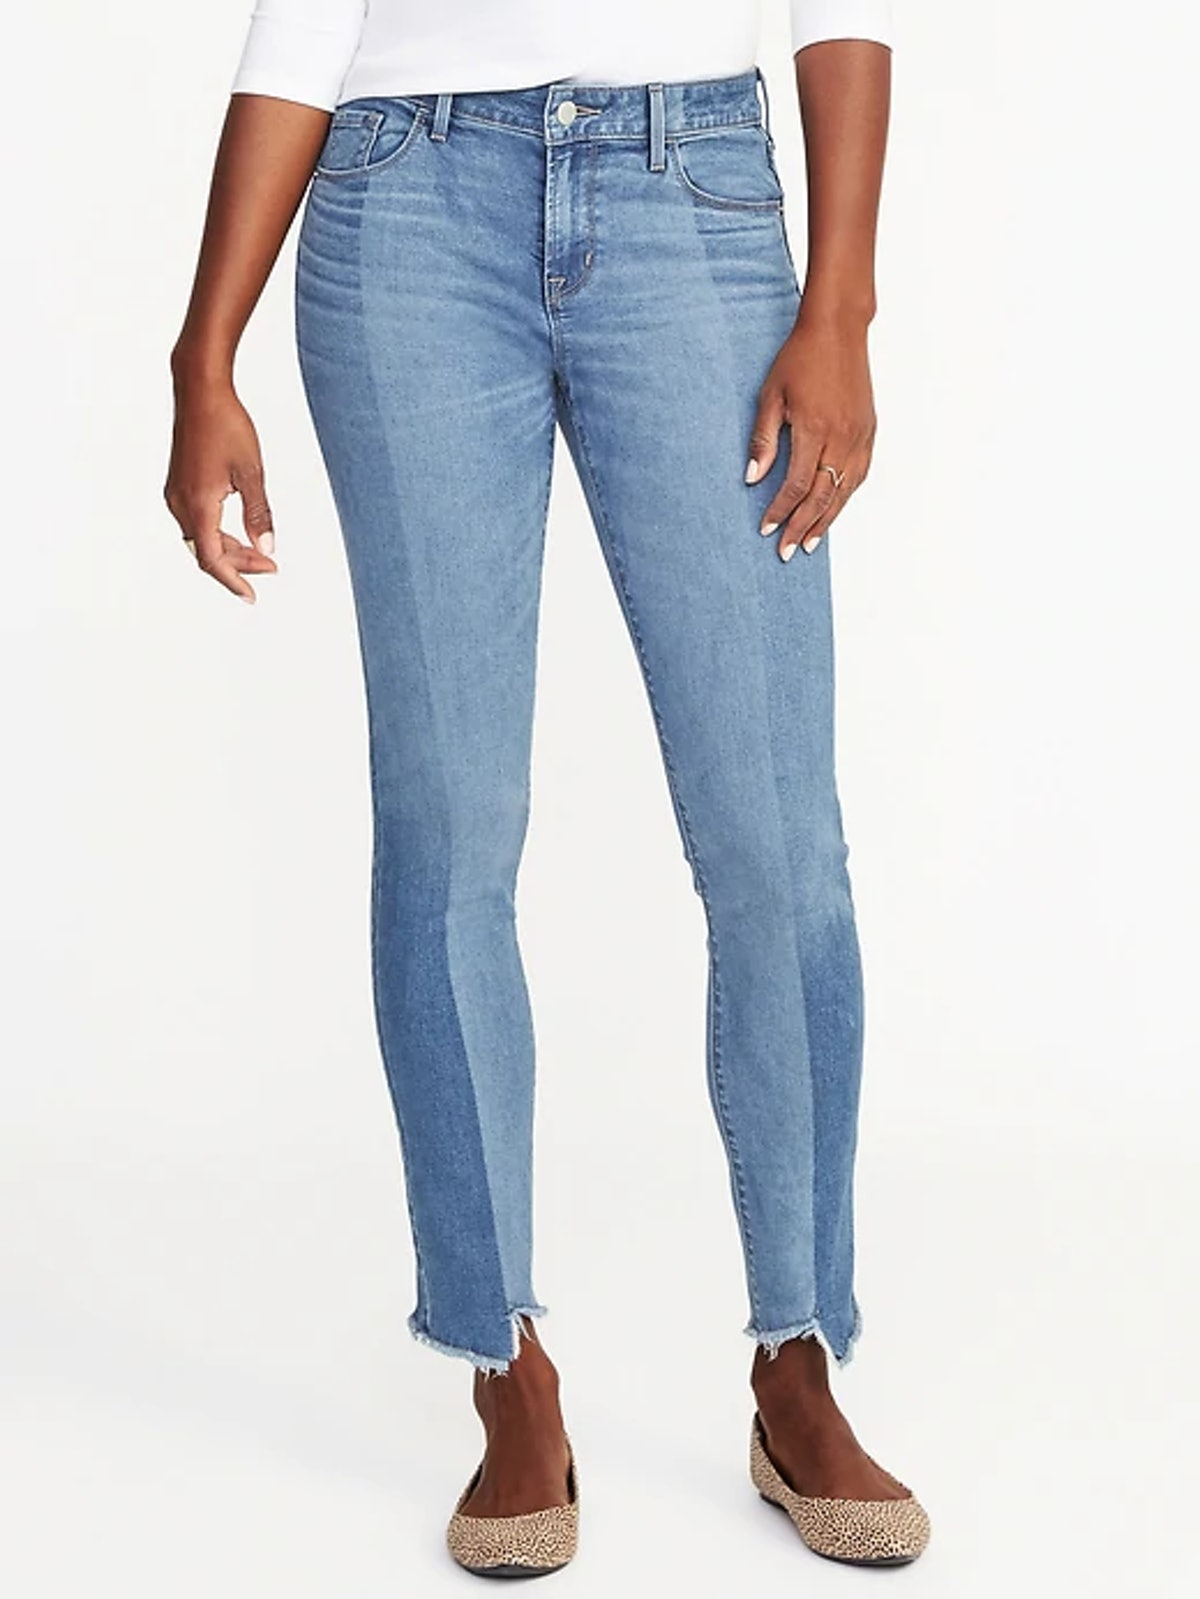 Mid-Rise Rockstar Raw-Edge Jeans for Women